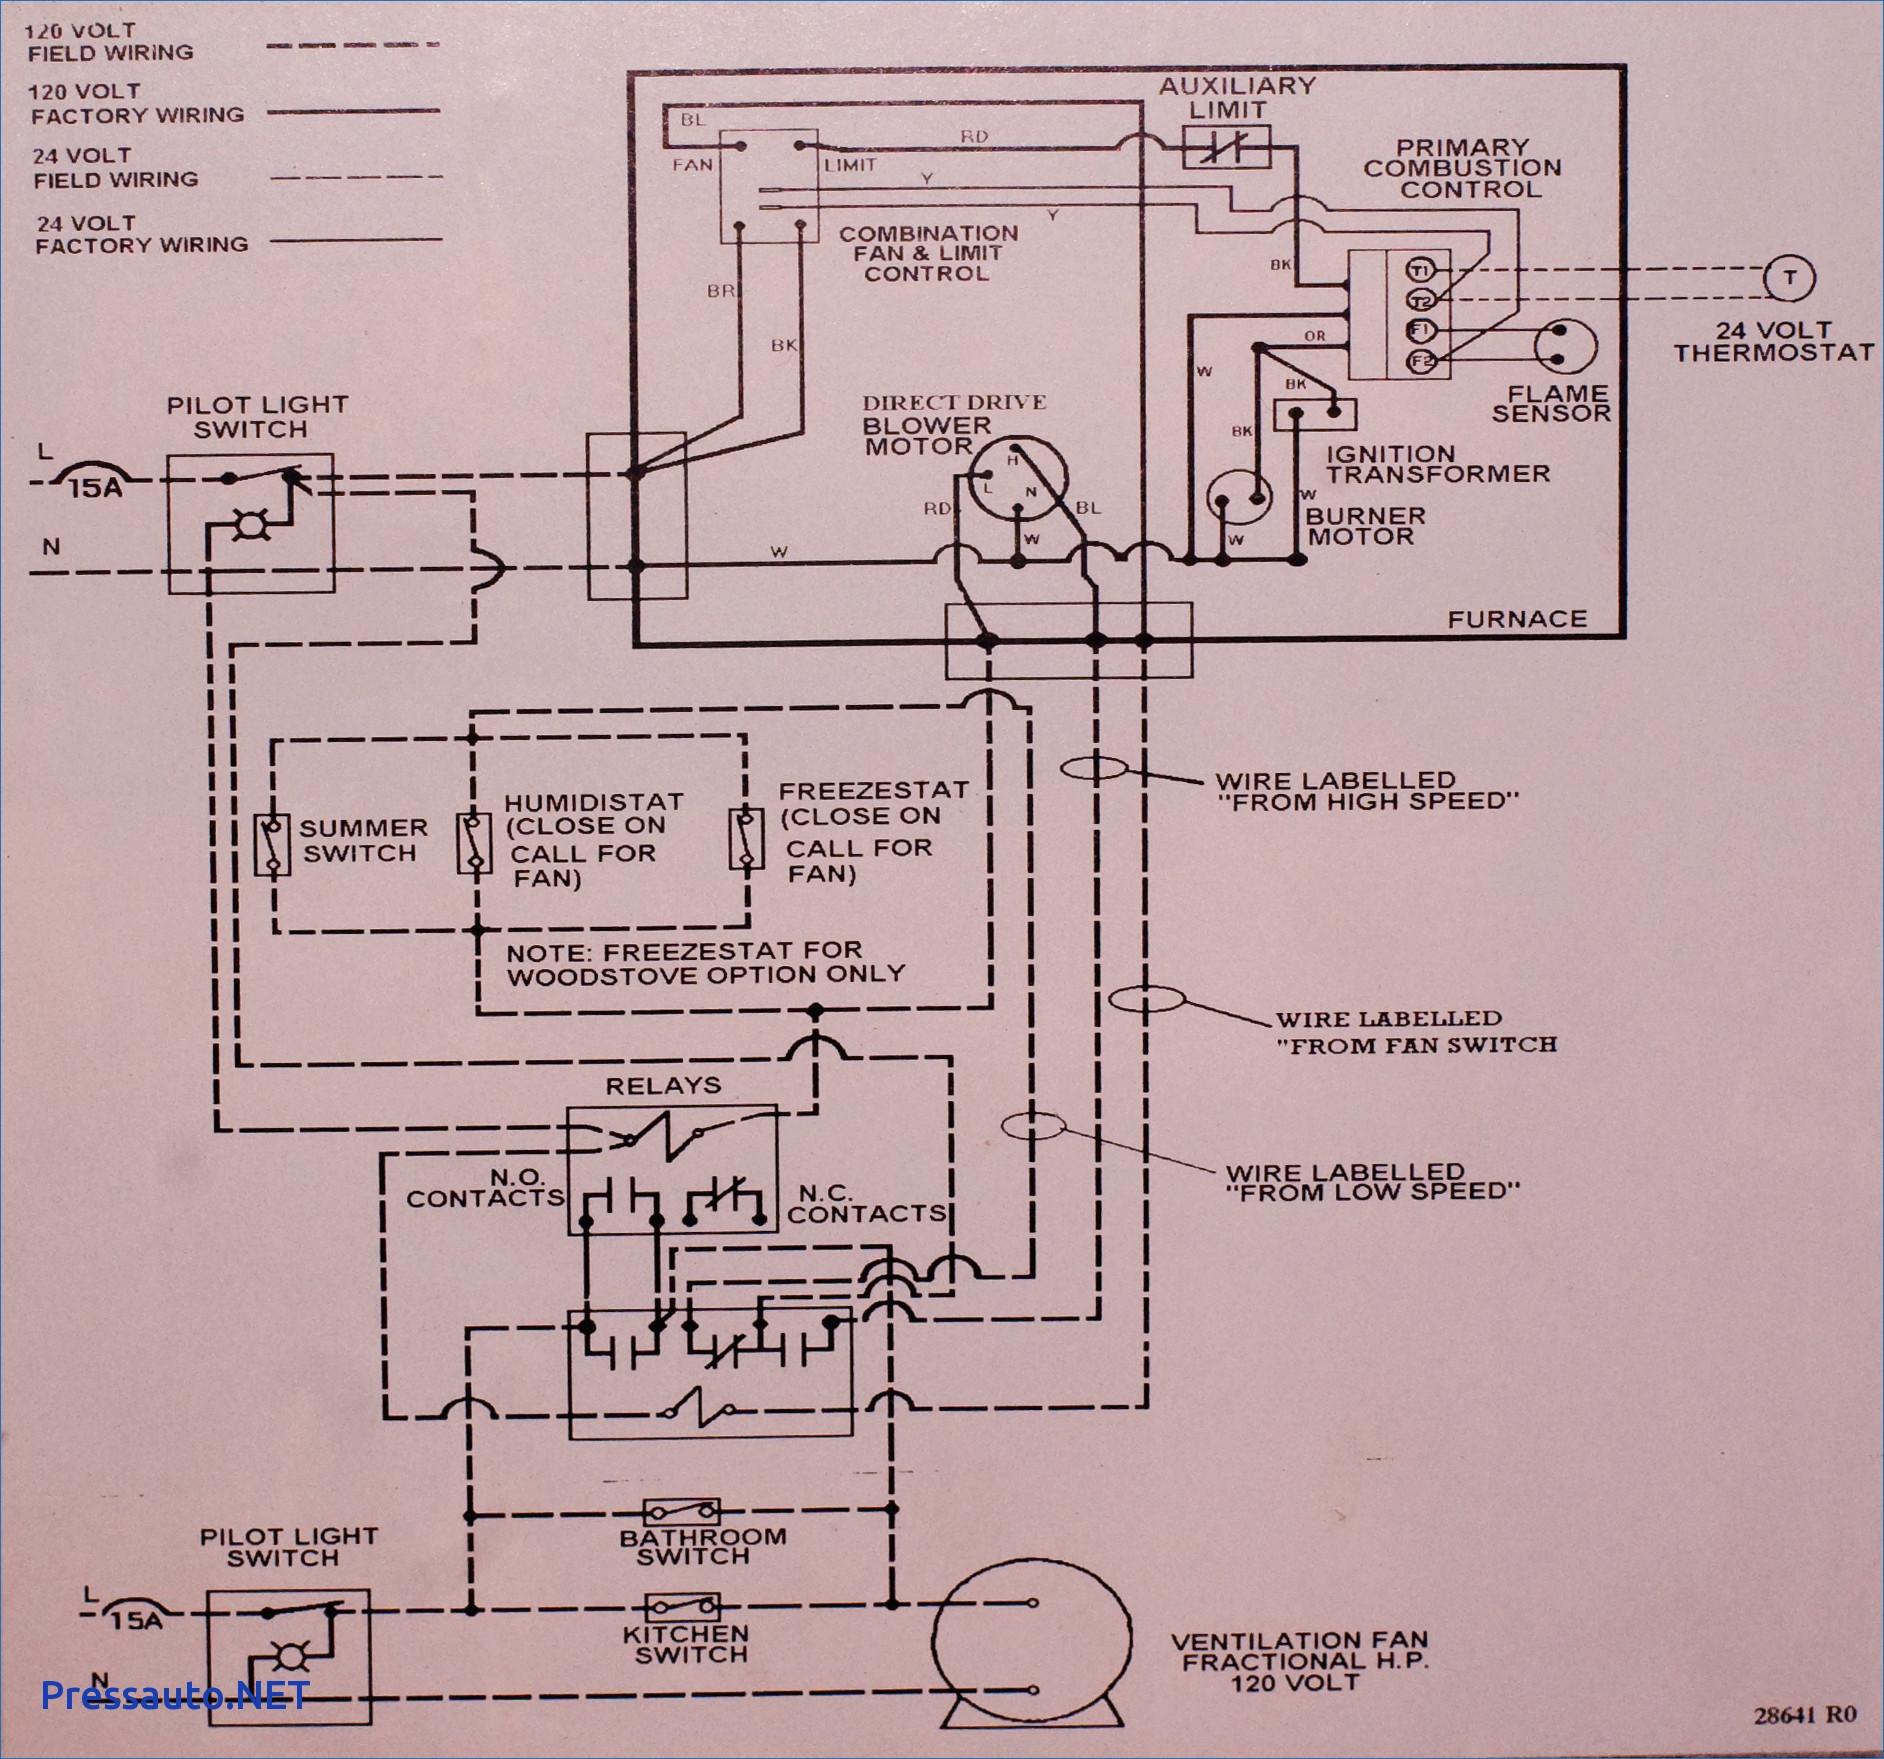 Climatrol Wiring Diagram - Arctic Cat 300 Wiring Diagram for Wiring Diagram  SchematicsWiring Diagram Schematics